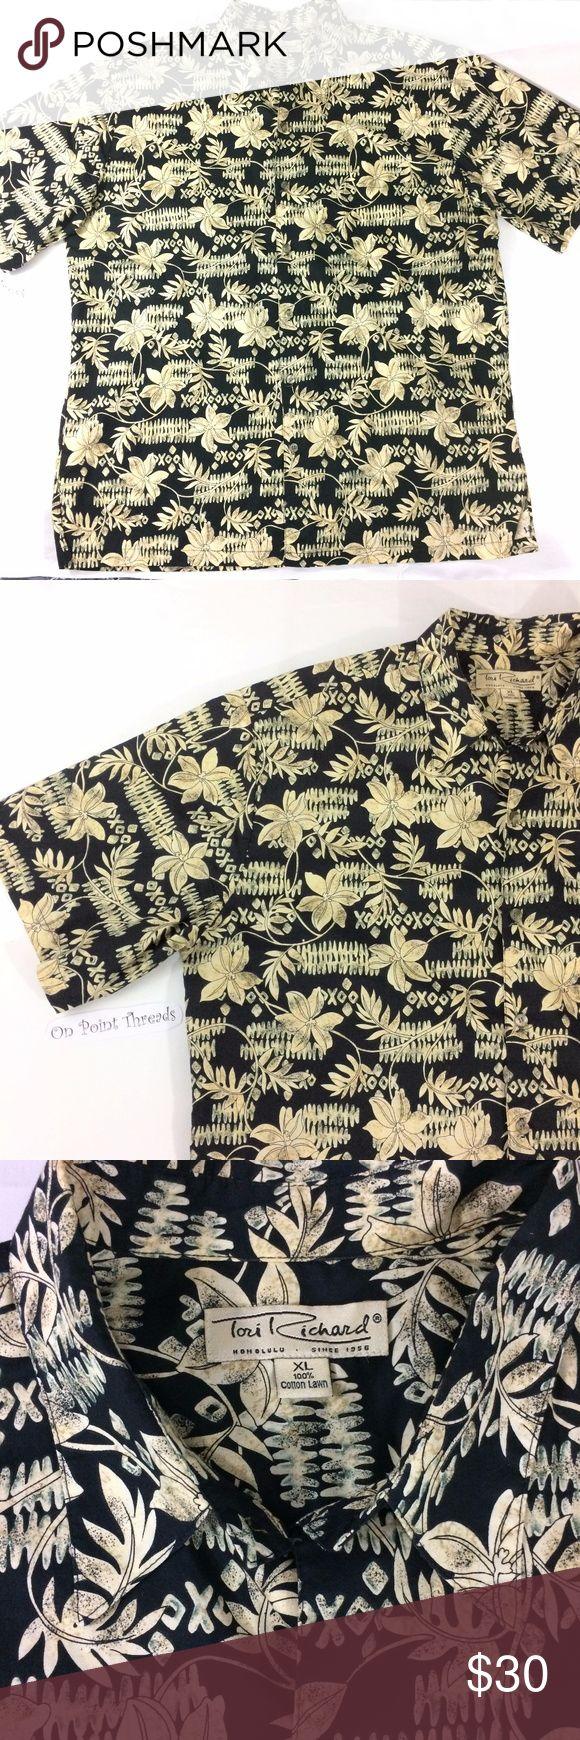 Tori Richards  Hawaiian print Shirt Mens XL fun printed Hawaiian shirt in size xl by tori richards Tori Richards Shirts Casual Button Down Shirts